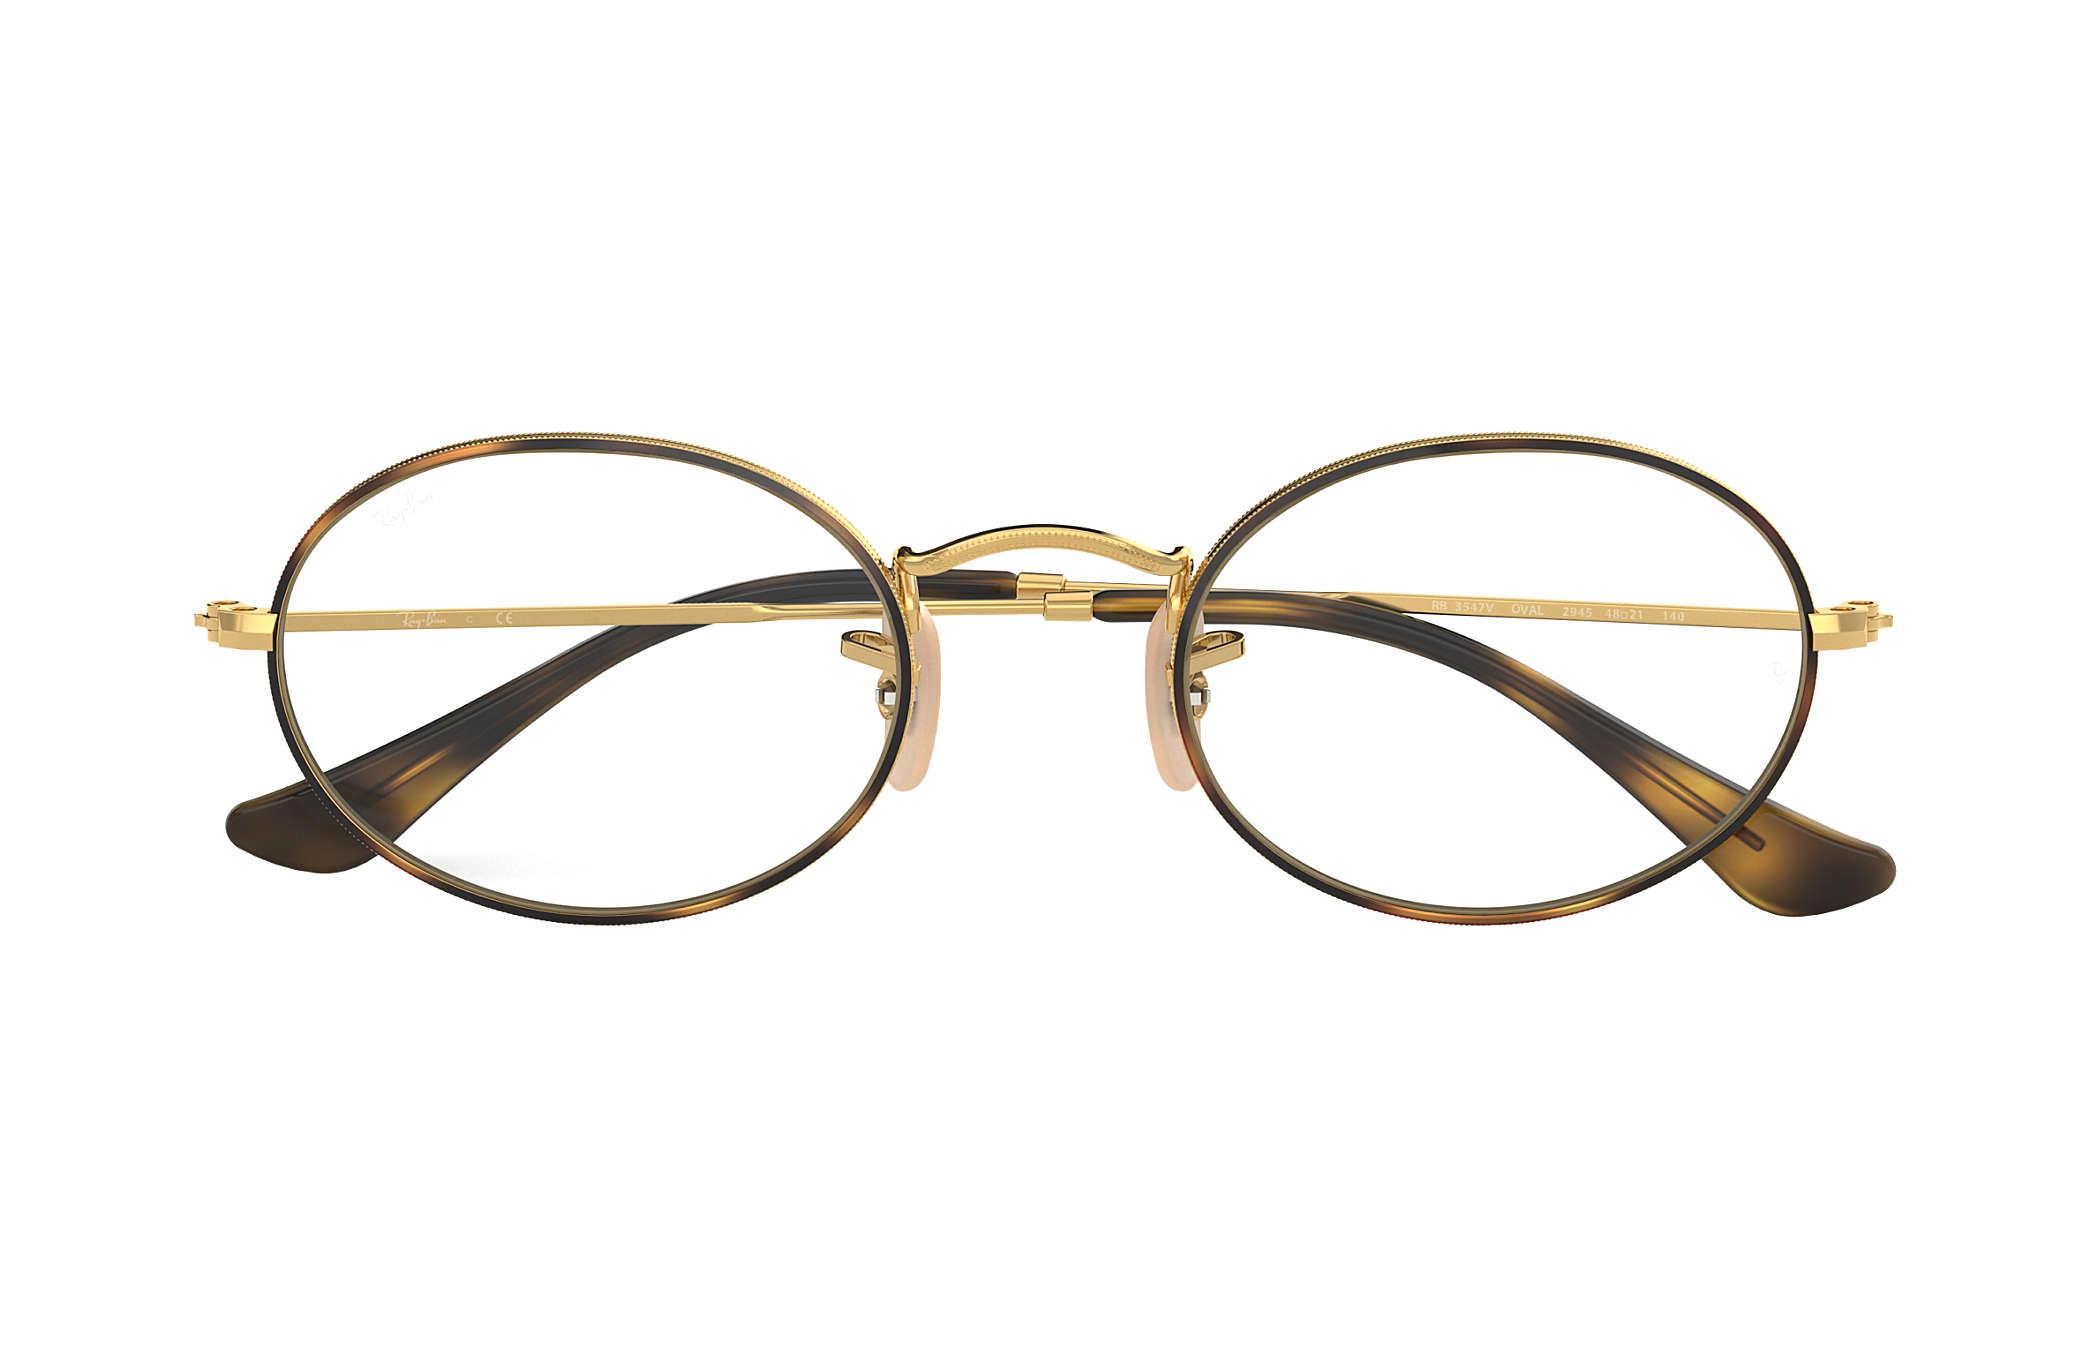 bba557685b Ray-Ban prescription glasses Oval Optics RB3547V Tortoise - Metal ...